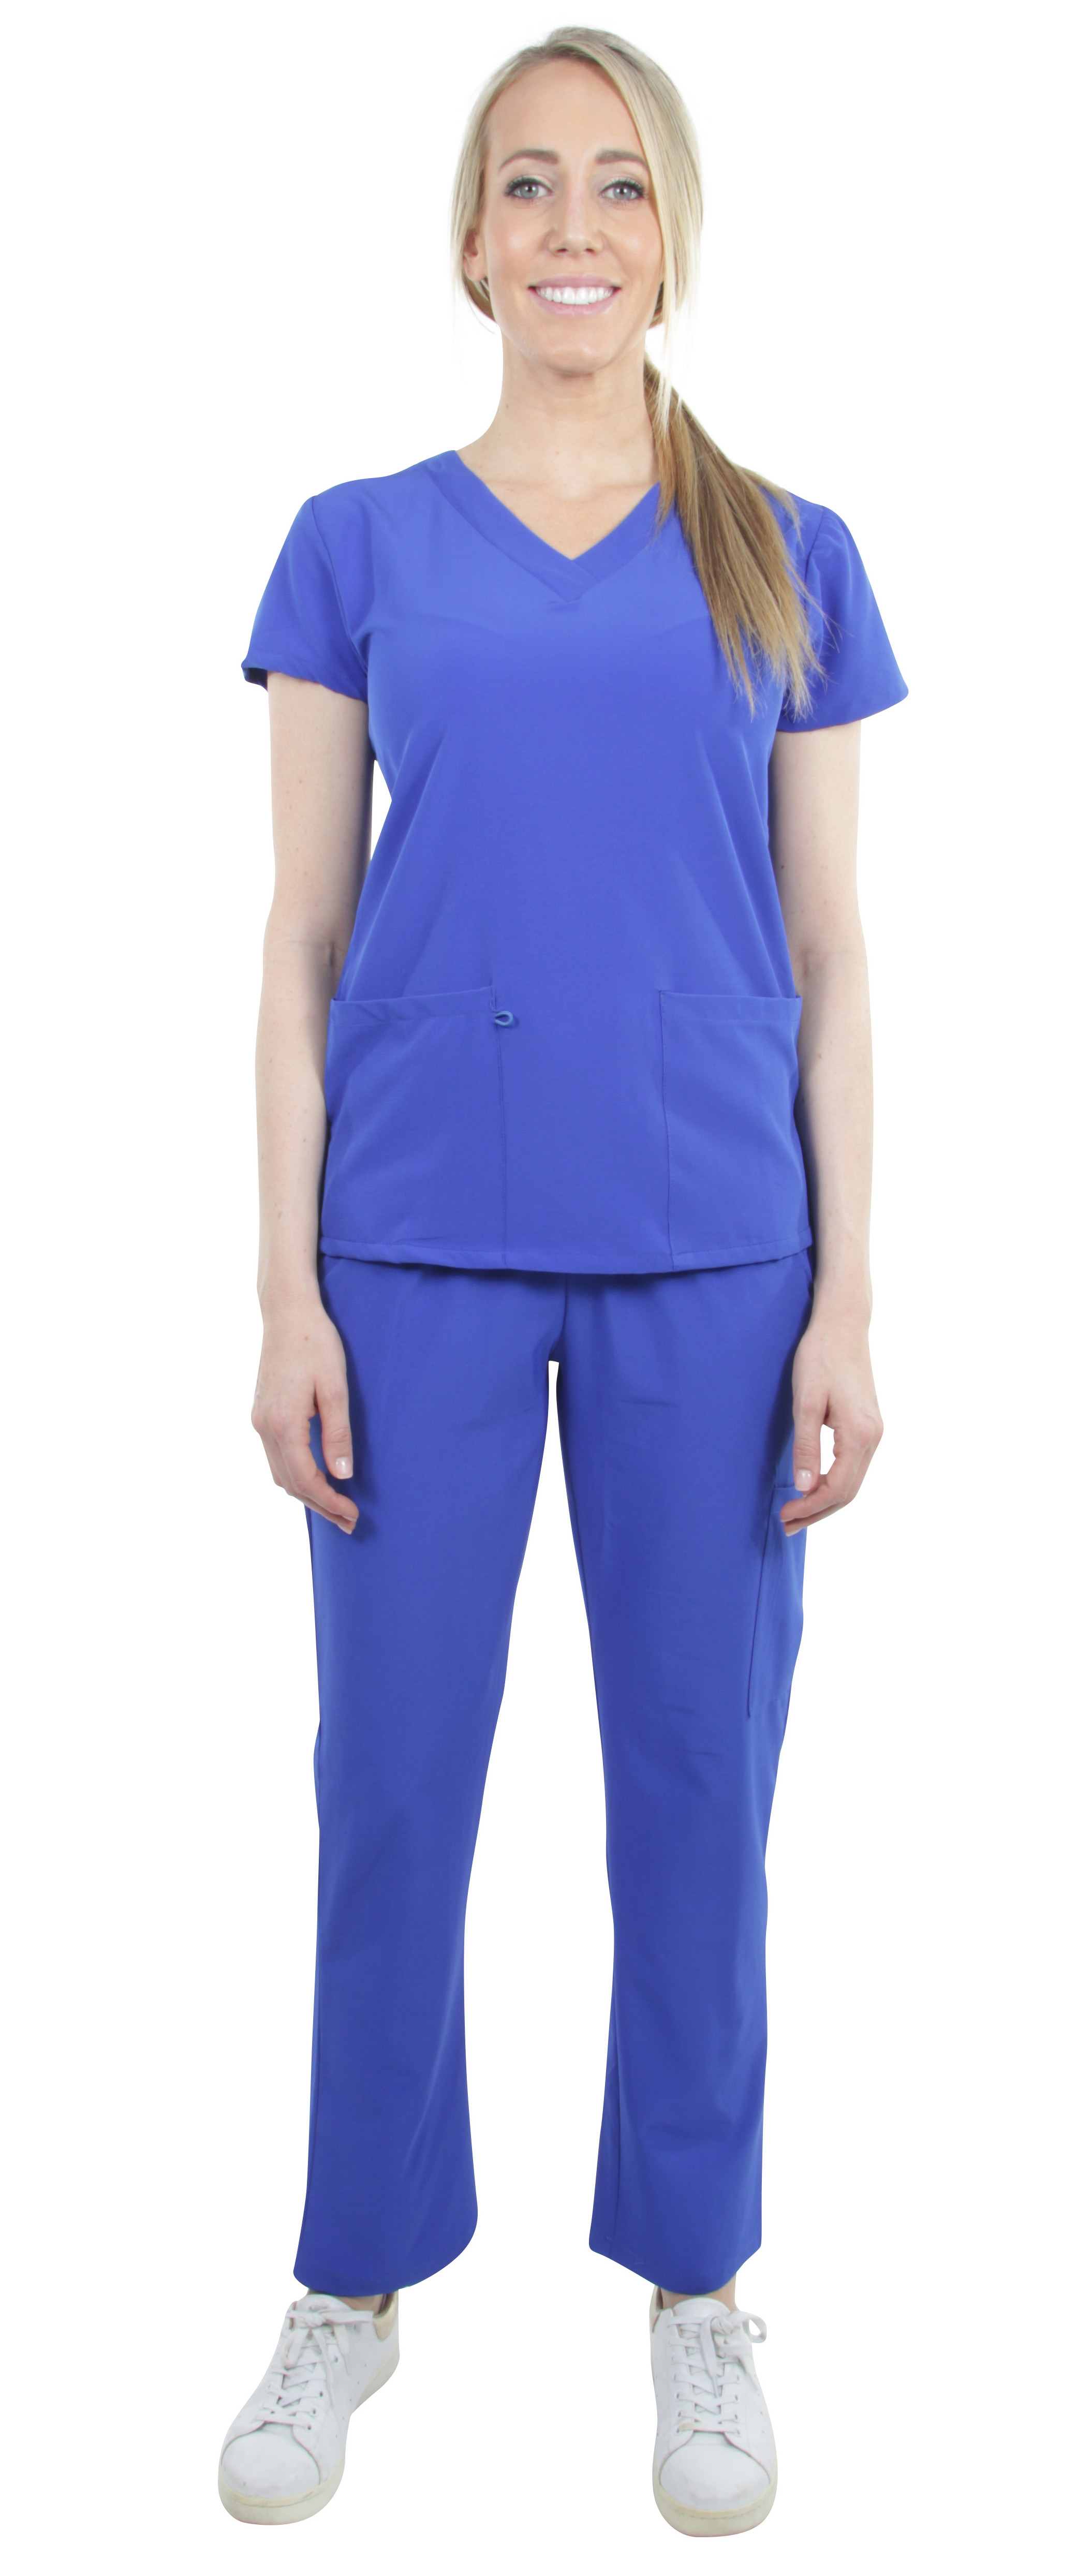 Unisex-Performance-Stretch-Medical-Uniform-Five-Pockets-V-Neck-Scrubs-Sets thumbnail 25